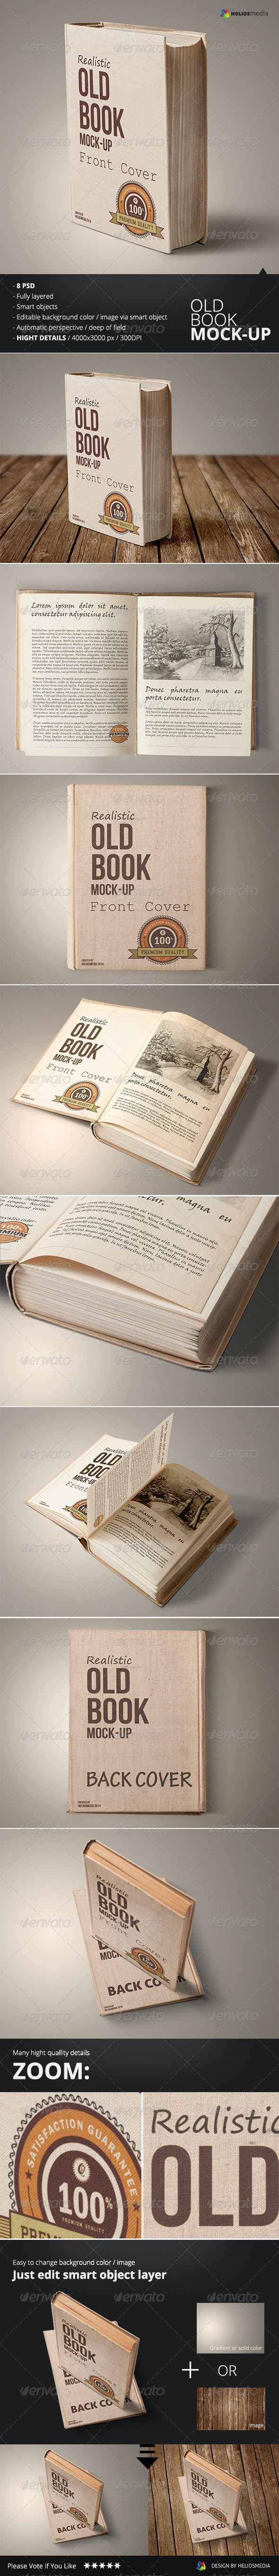 Old Book Mockup - Books Print